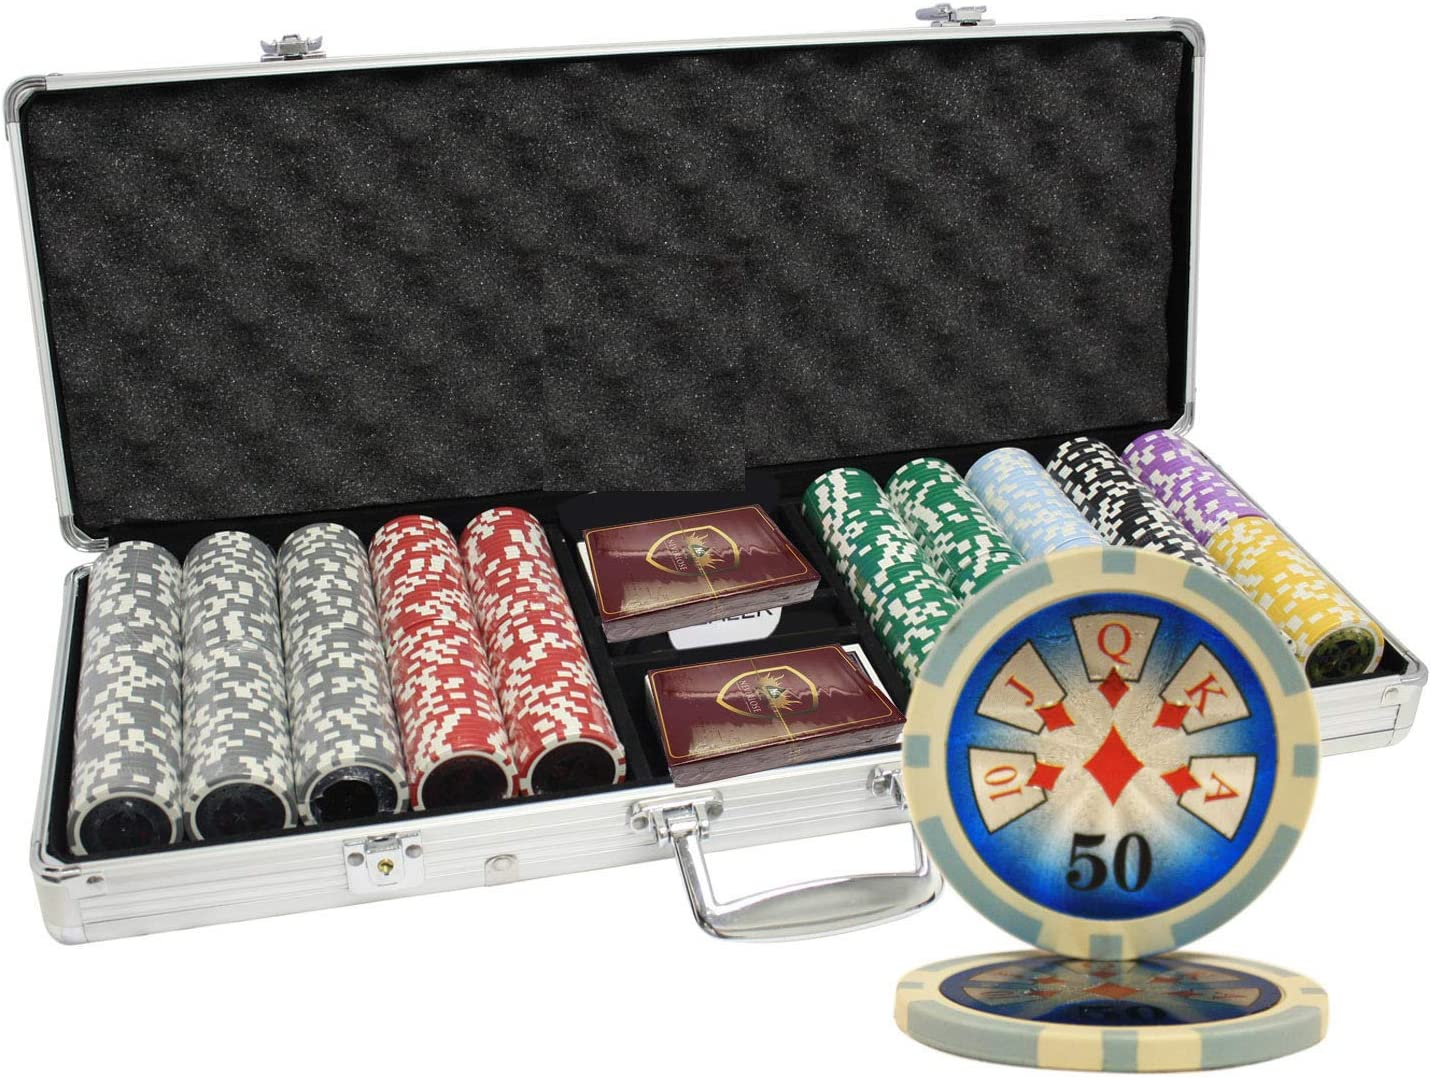 MRC 500pcs Boston Mall High NEW before selling ☆ Roller Laser Poker with Chips Set Case Aluminum